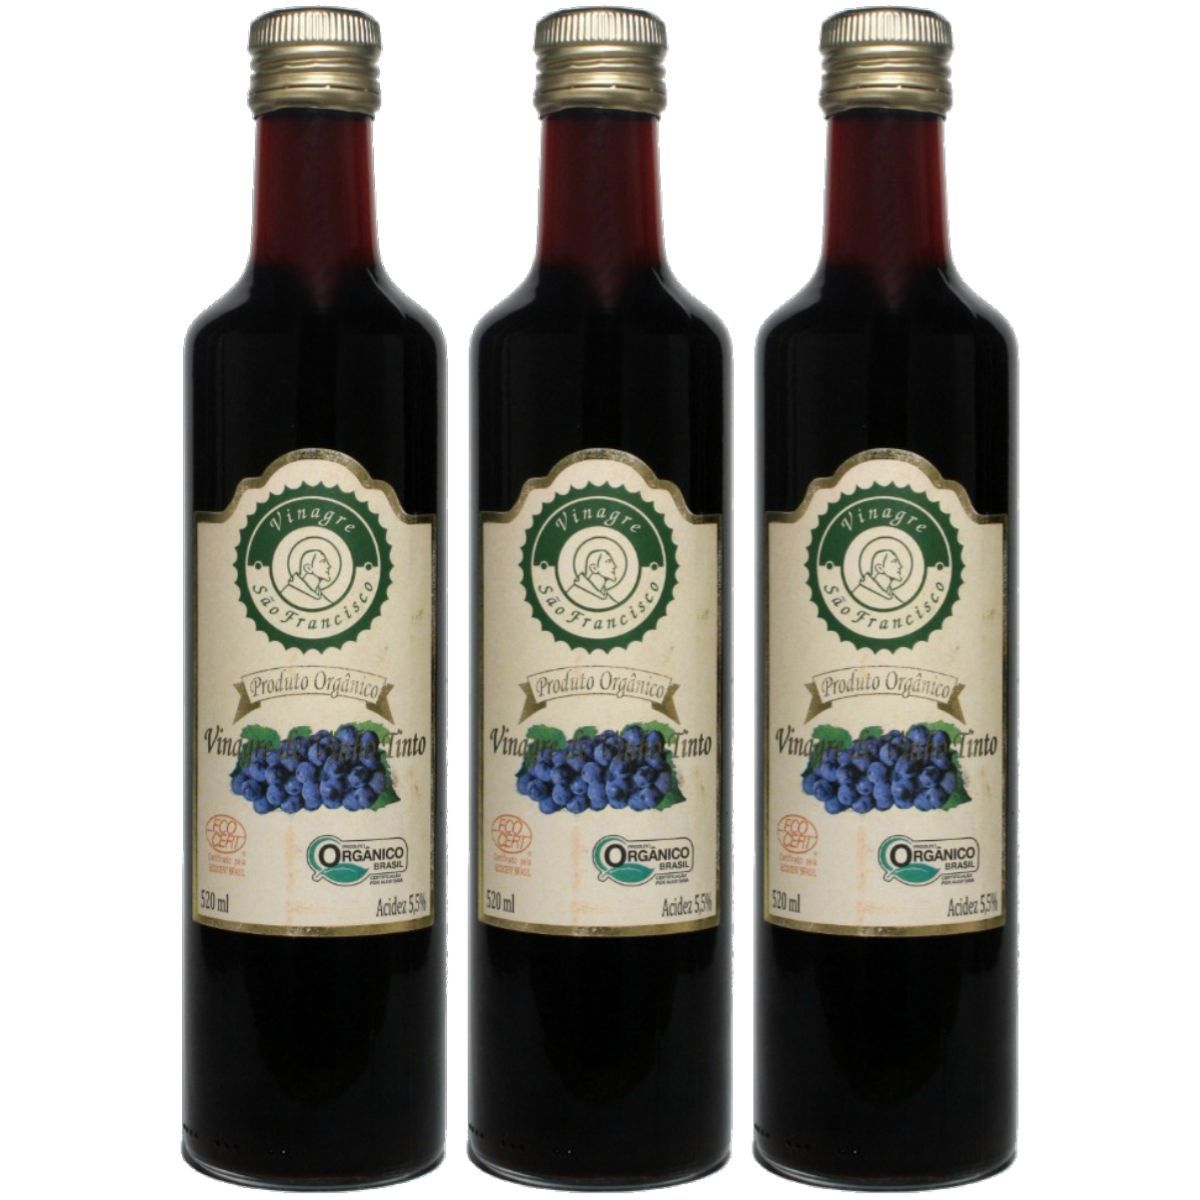 Kit 3 Vinagre Orgânico São Francisco Vinho Tinto Acidez 5,5% - 500ml